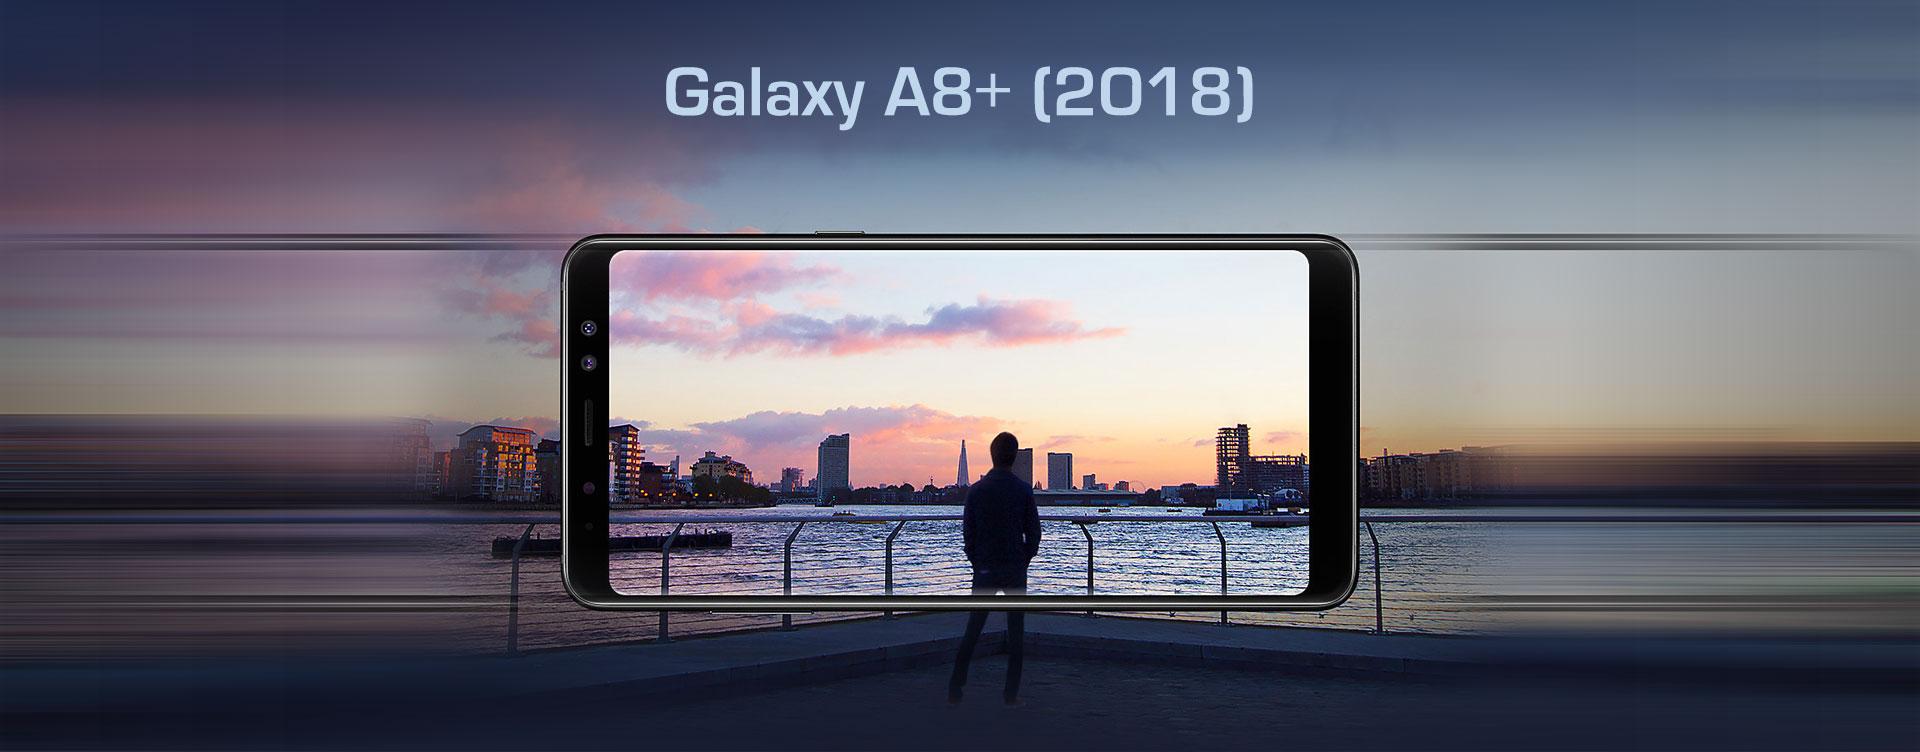 گوشی موبایل سامسونگ گلکسی A8 پلاس